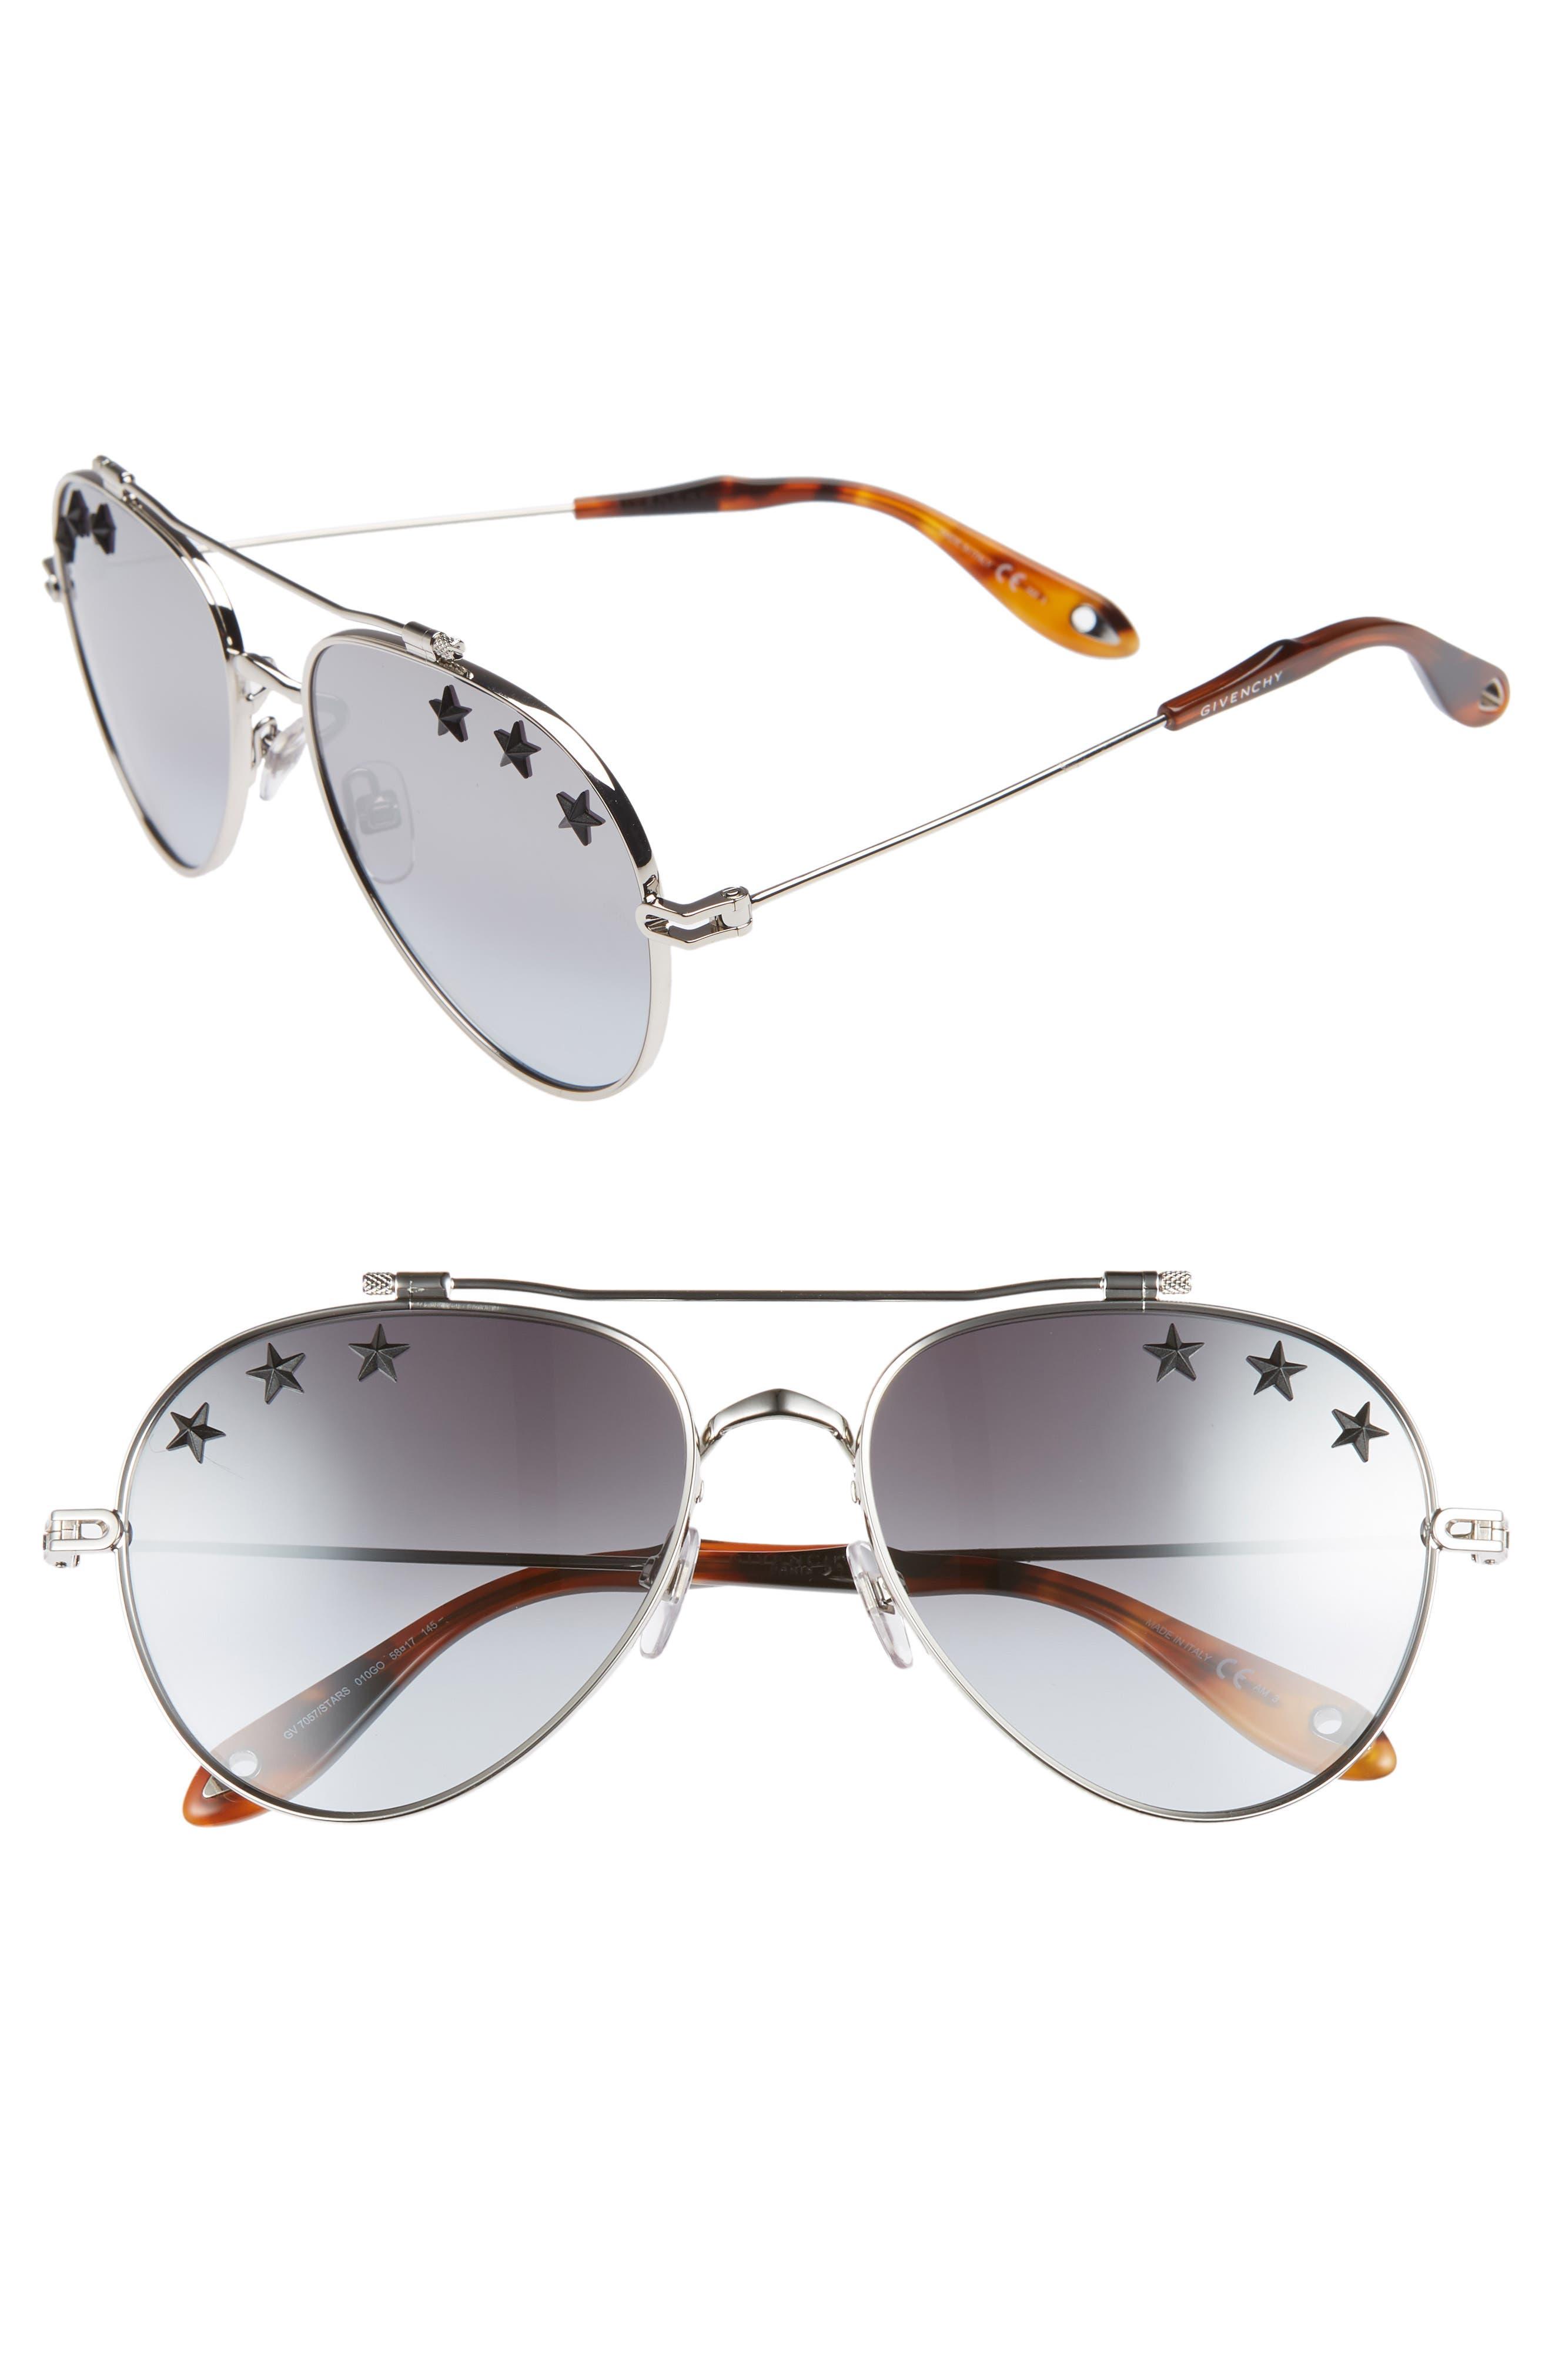 Star Detail 58mm Mirrored Aviator Sunglasses,                             Main thumbnail 1, color,                             PALLADIUM/ GREY AZURE